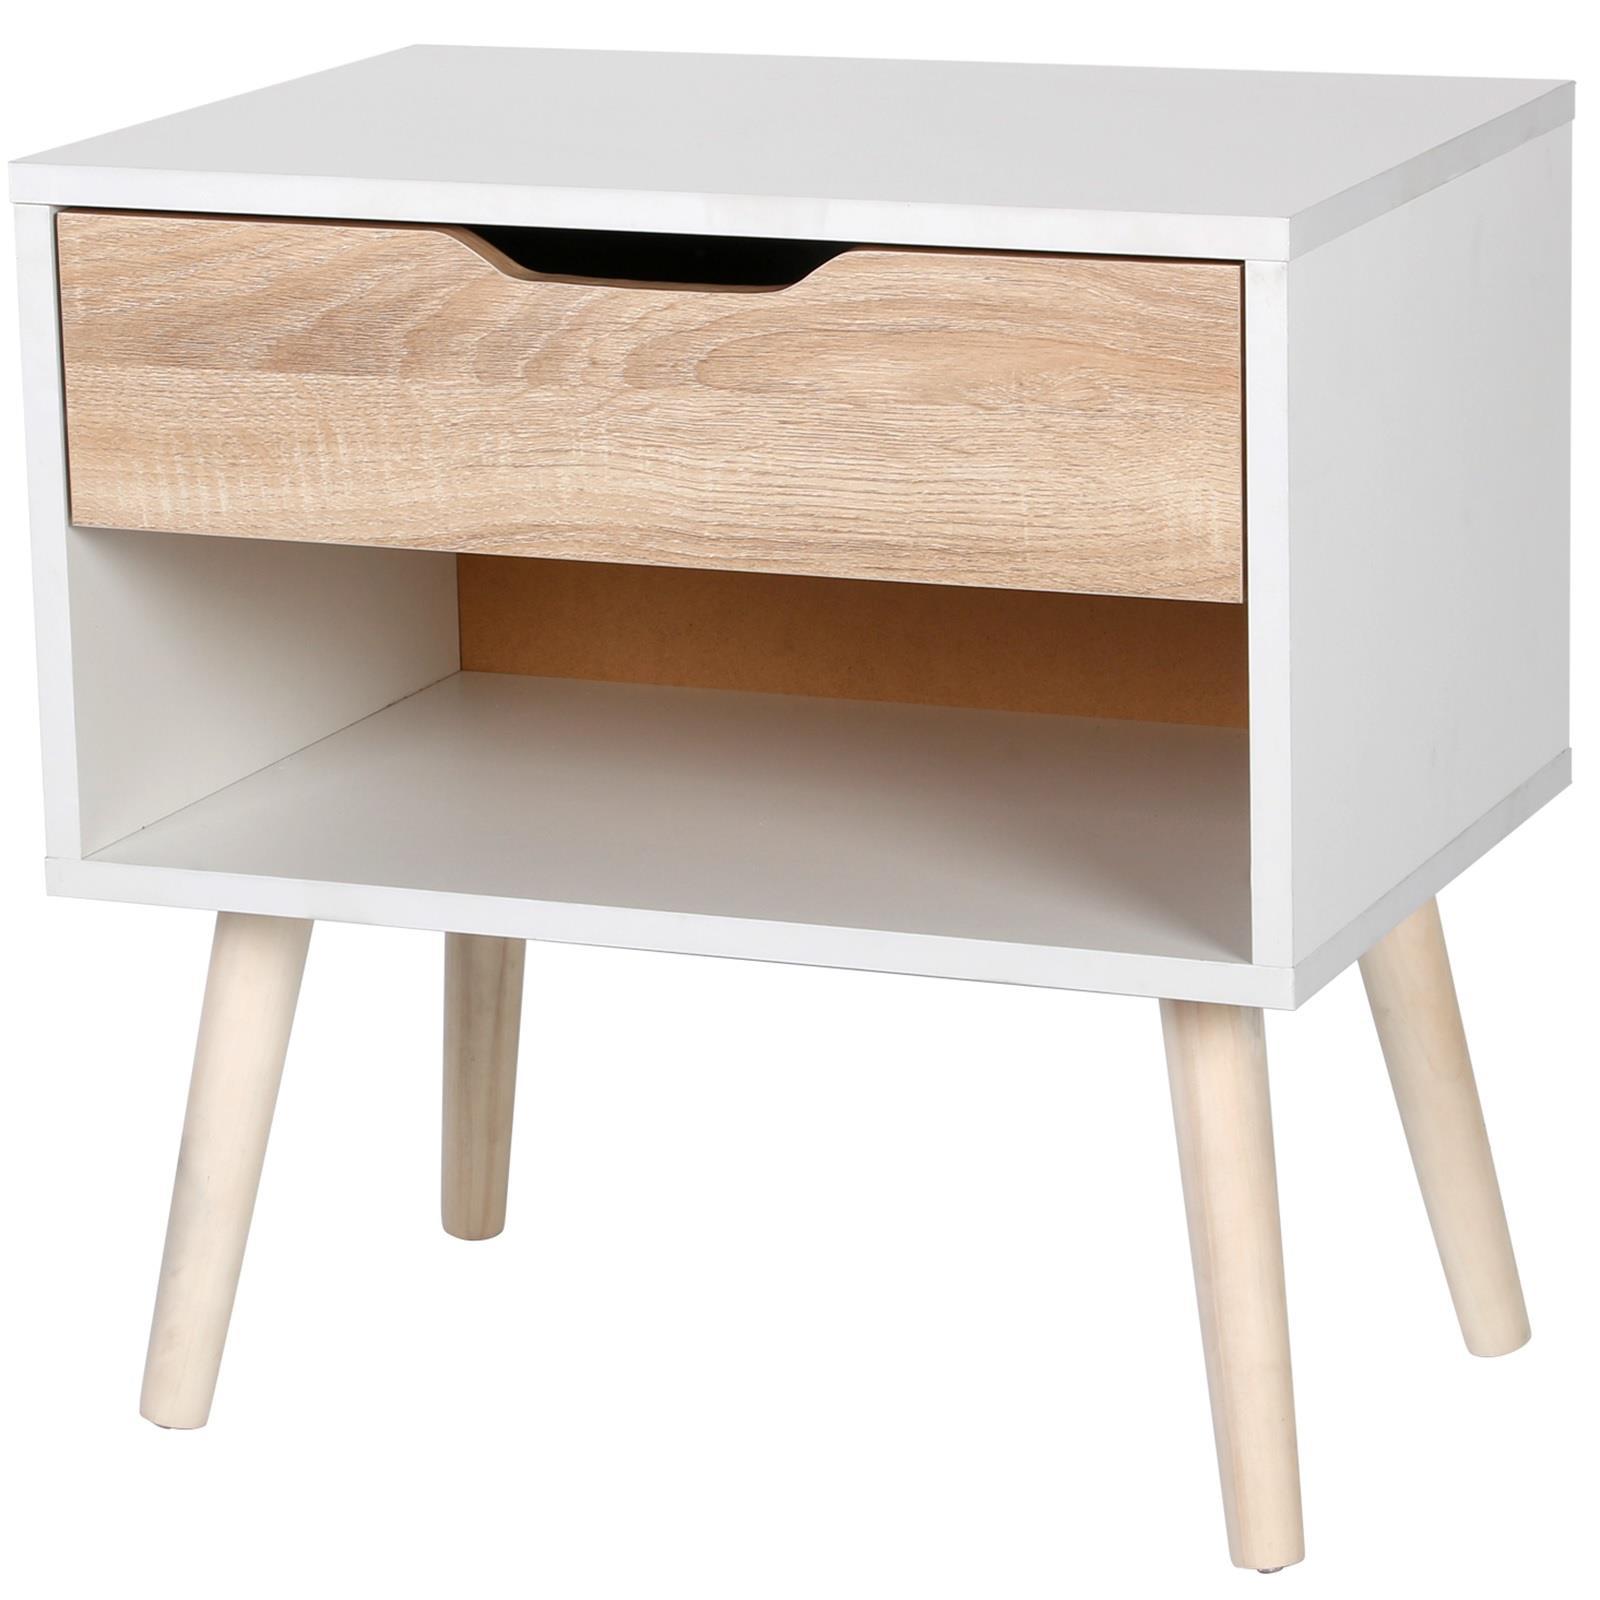 Gr8 Home Bedside Table Scandinavian Nordic Style White Oak Effect Night Stand 5057102007630 Ebay